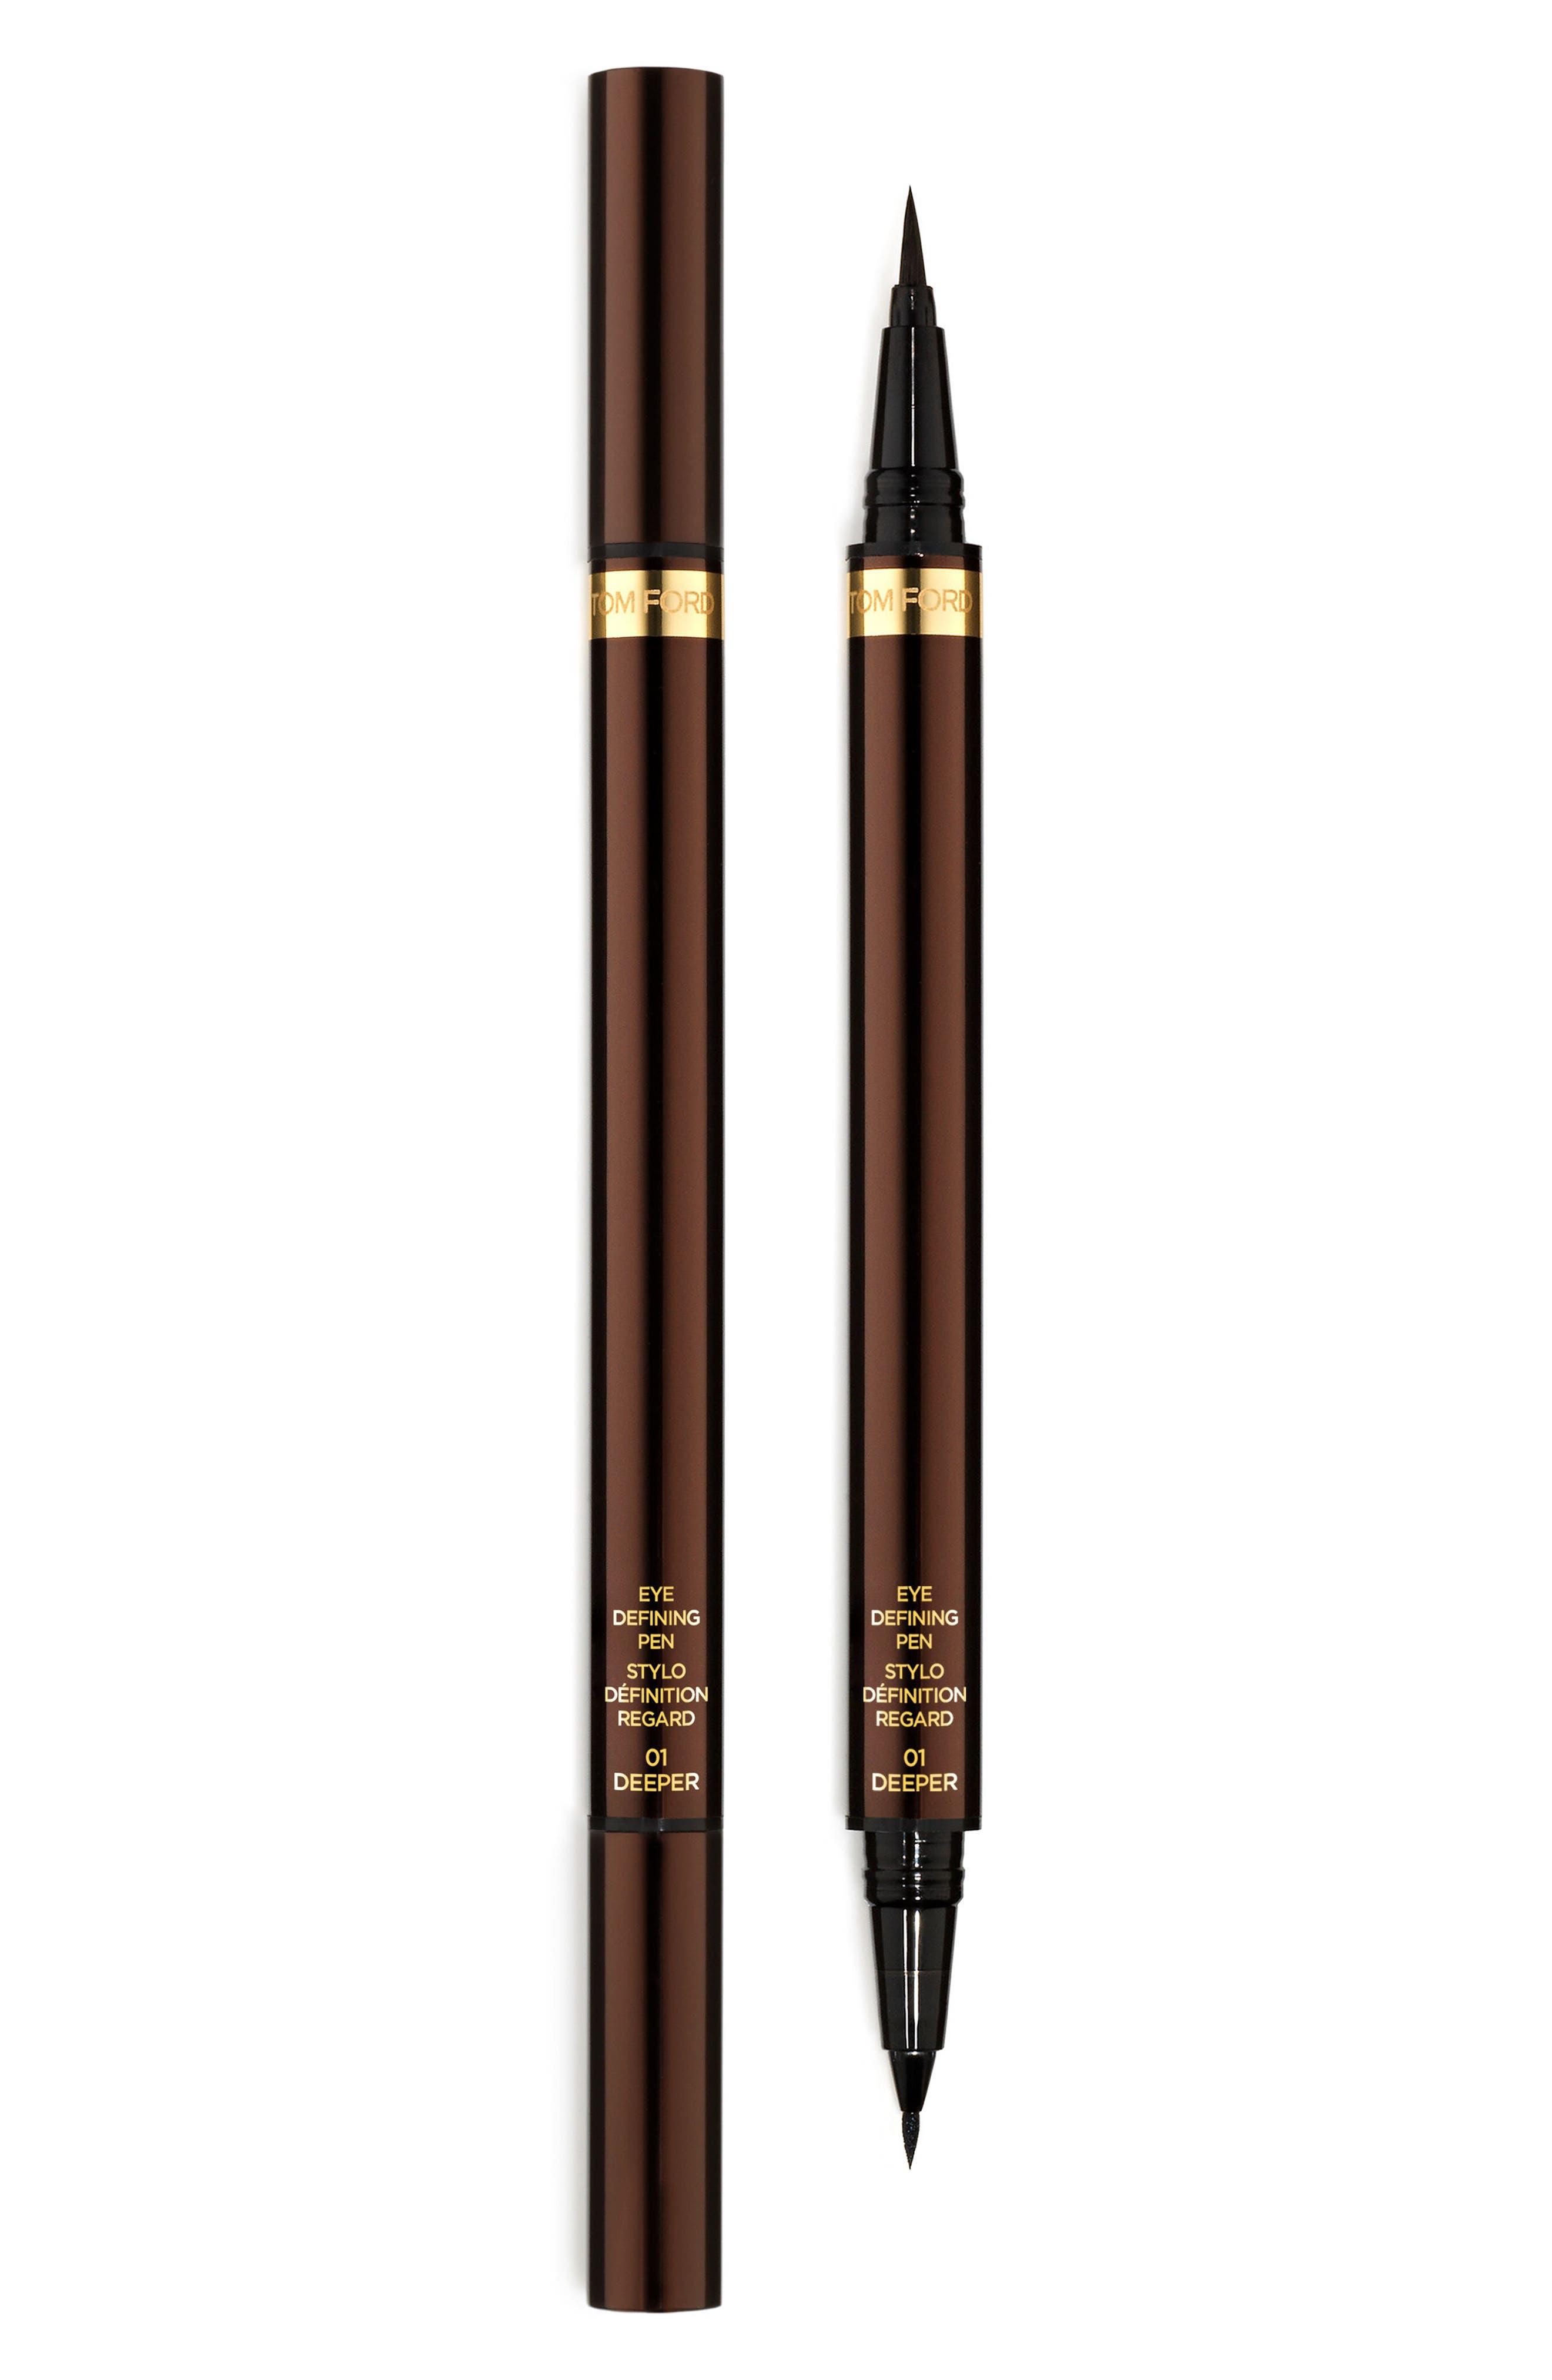 TOM FORD, Eye Defining Liquid Liner Pen, Main thumbnail 1, color, DEEPER